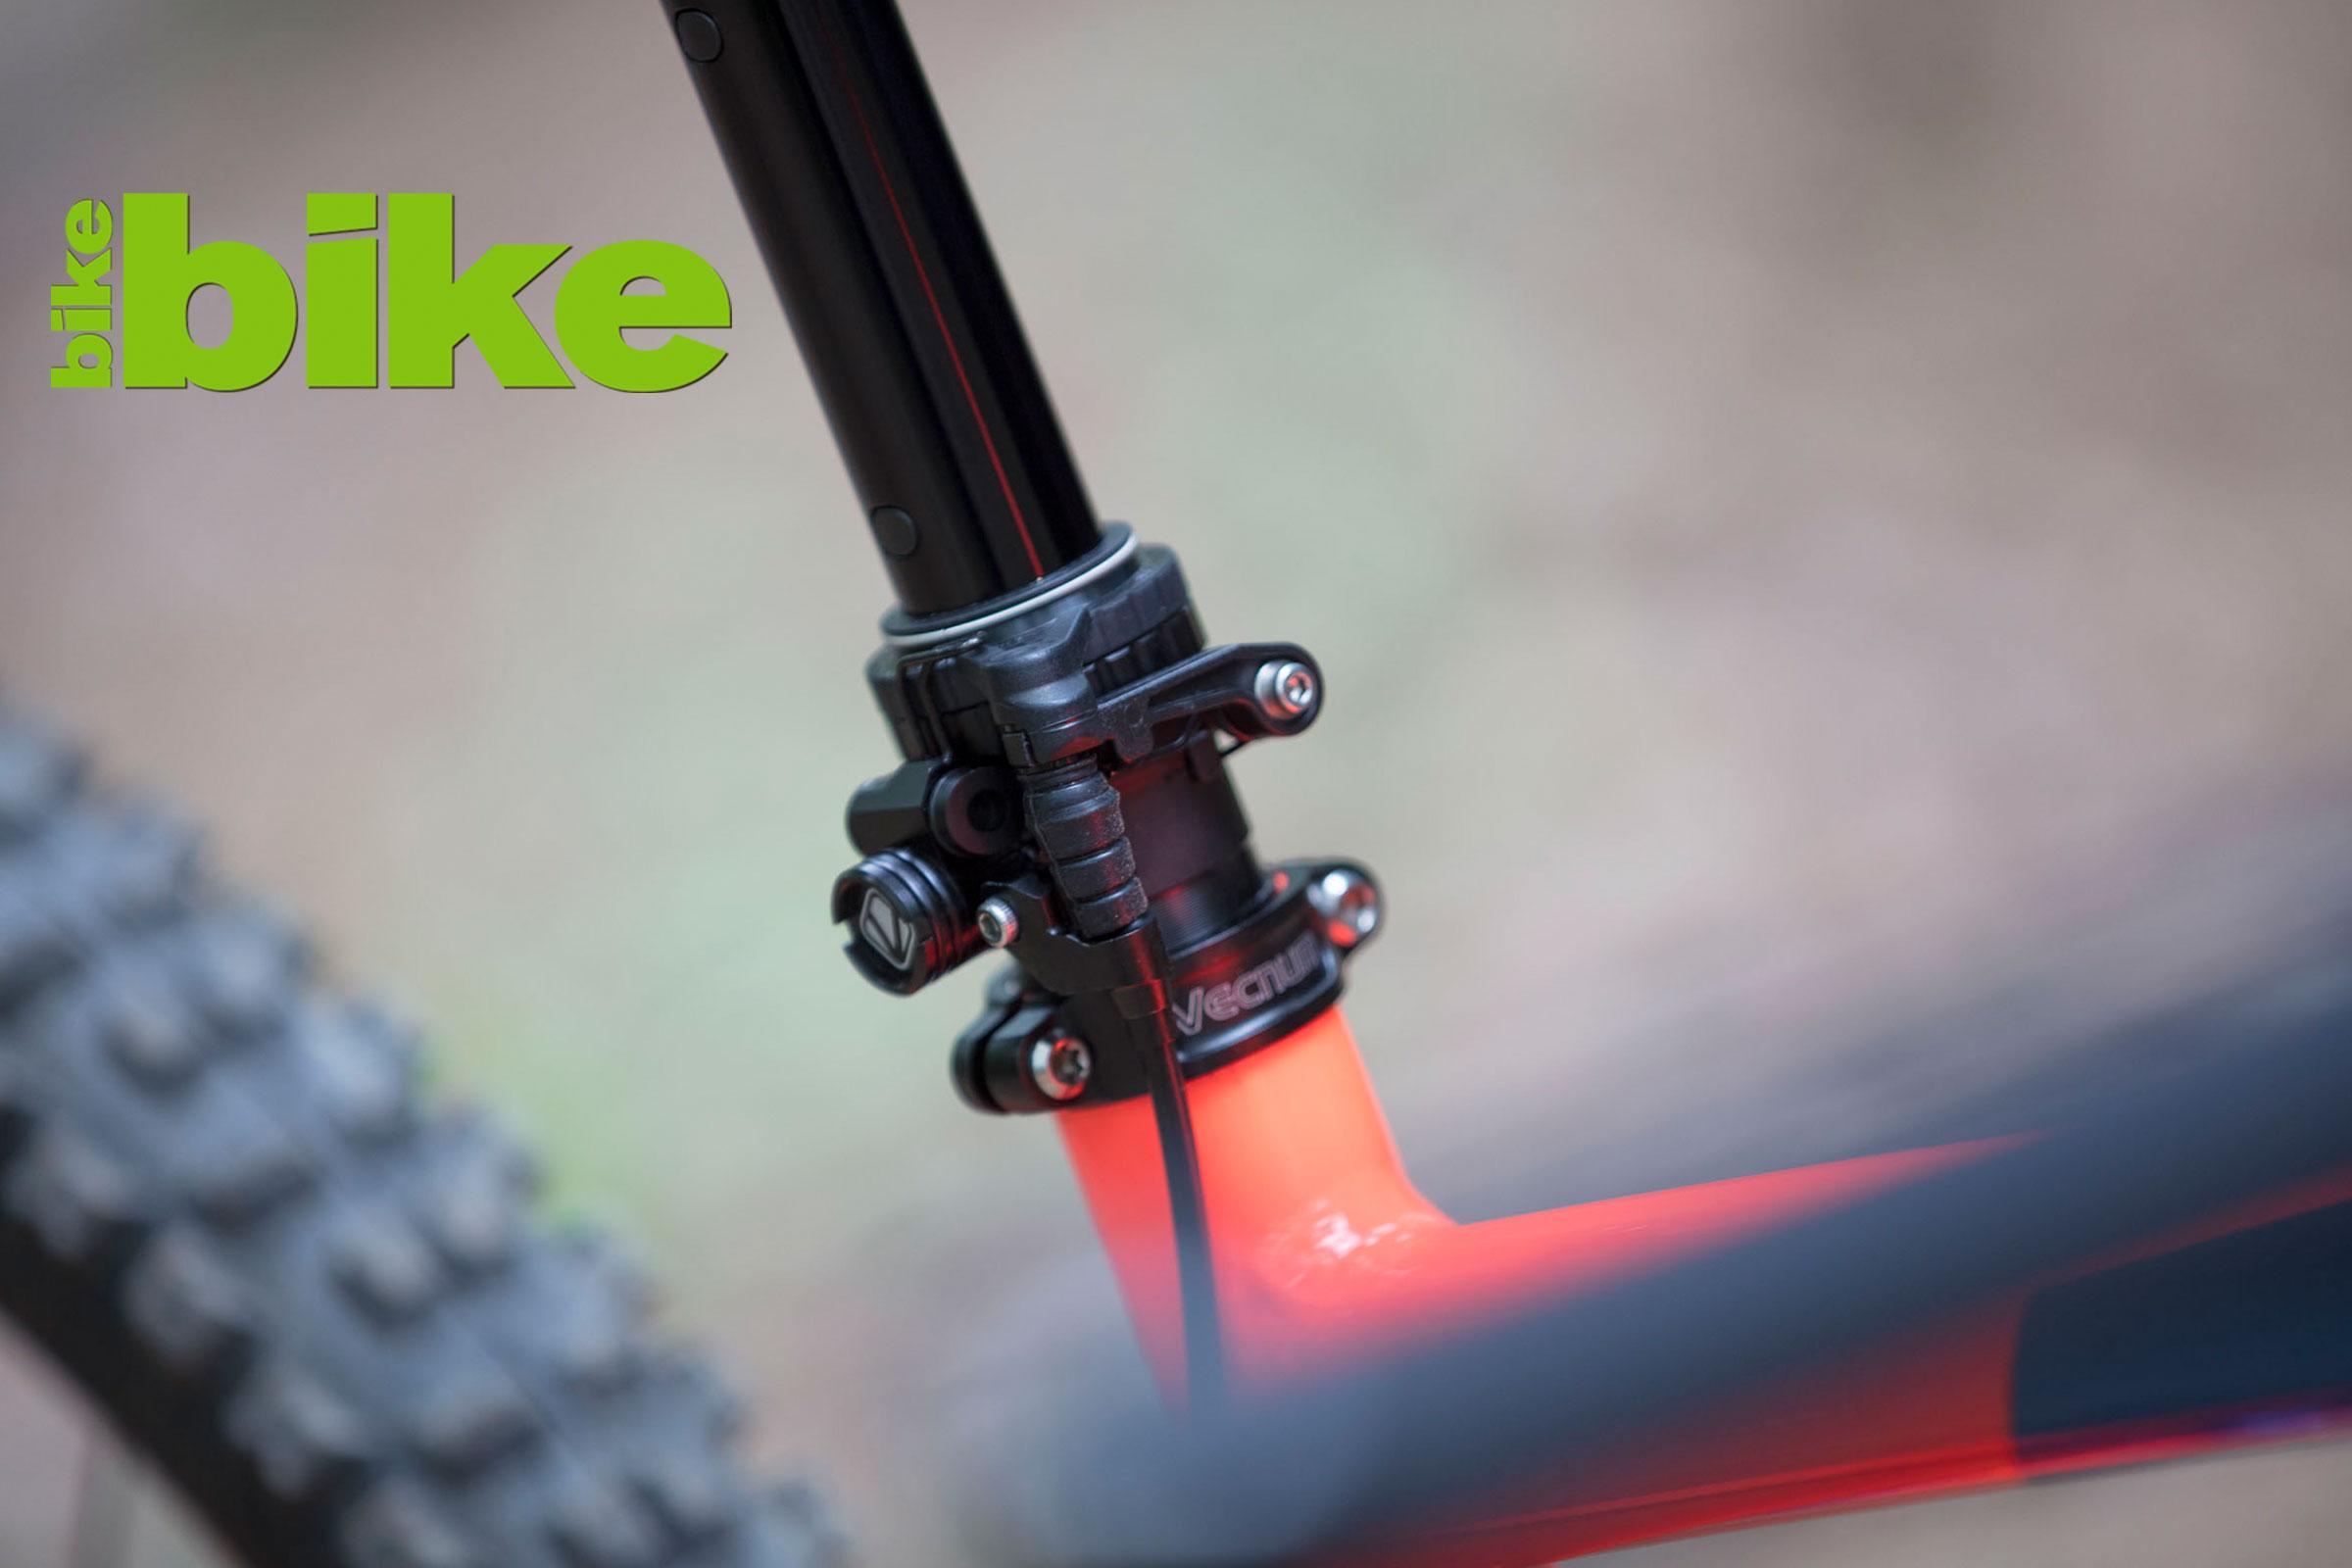 Bike 1/2014 - Thomson & Vecnum vs. Reverb